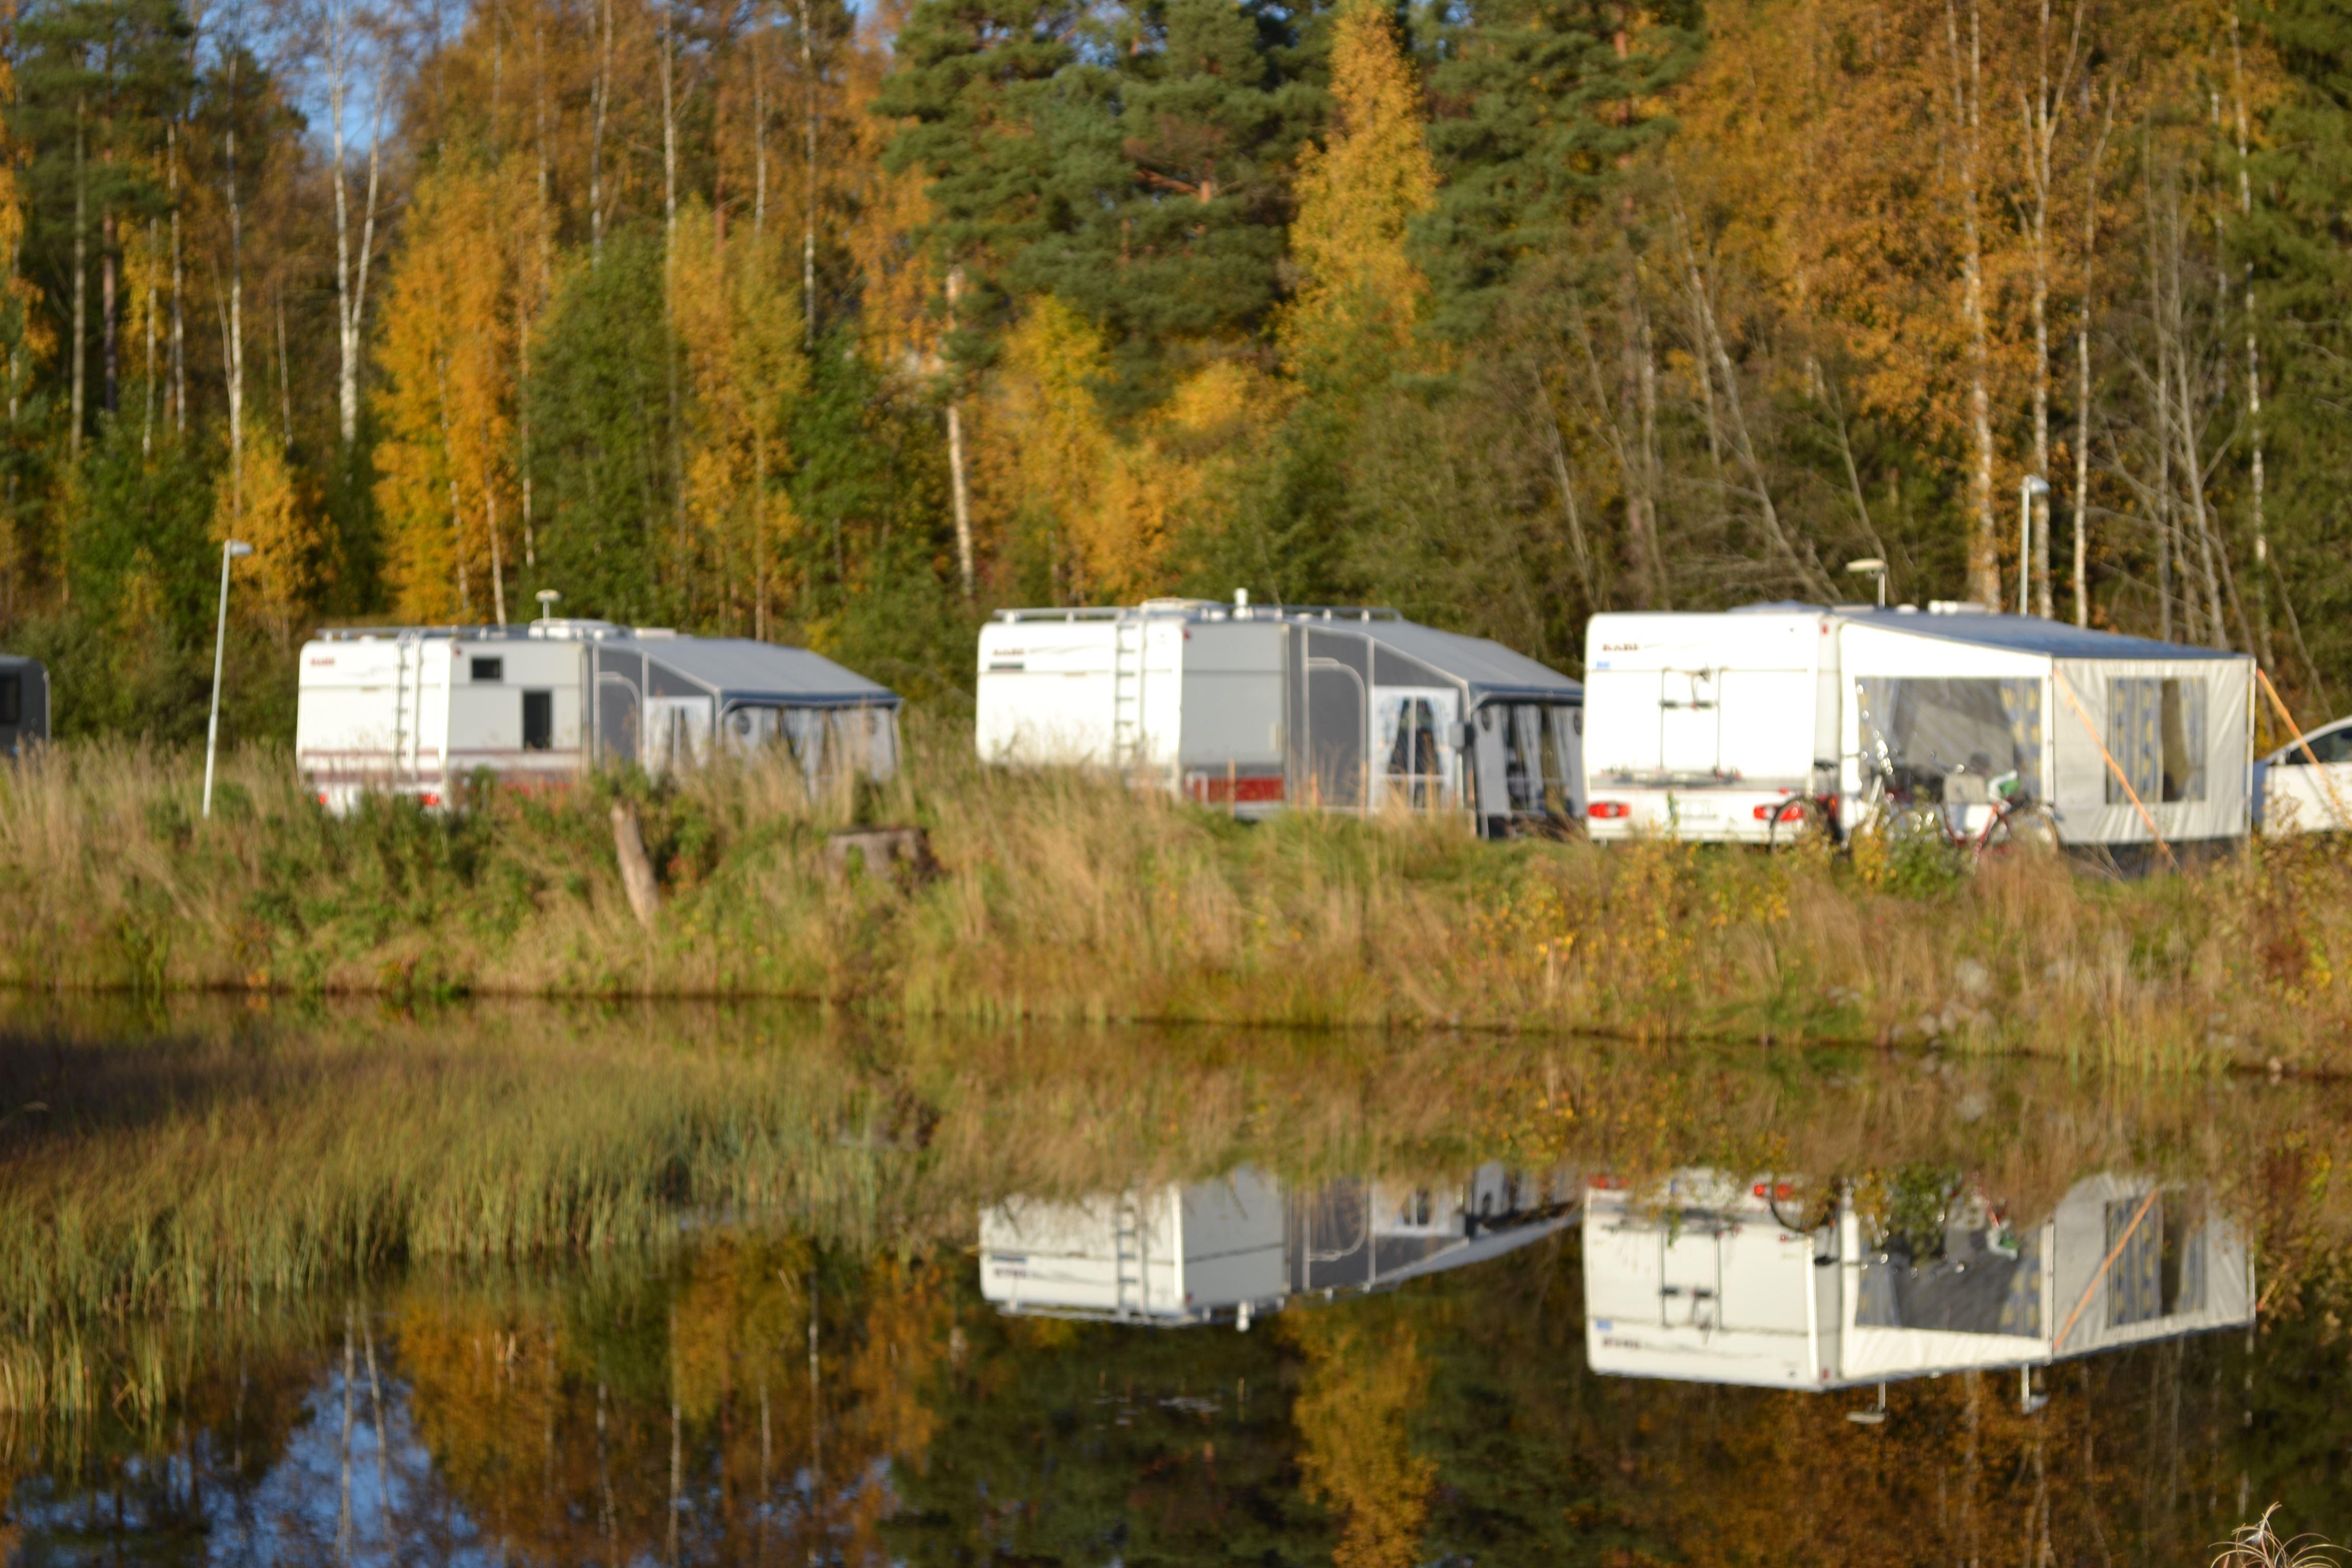 Rättviks Camping